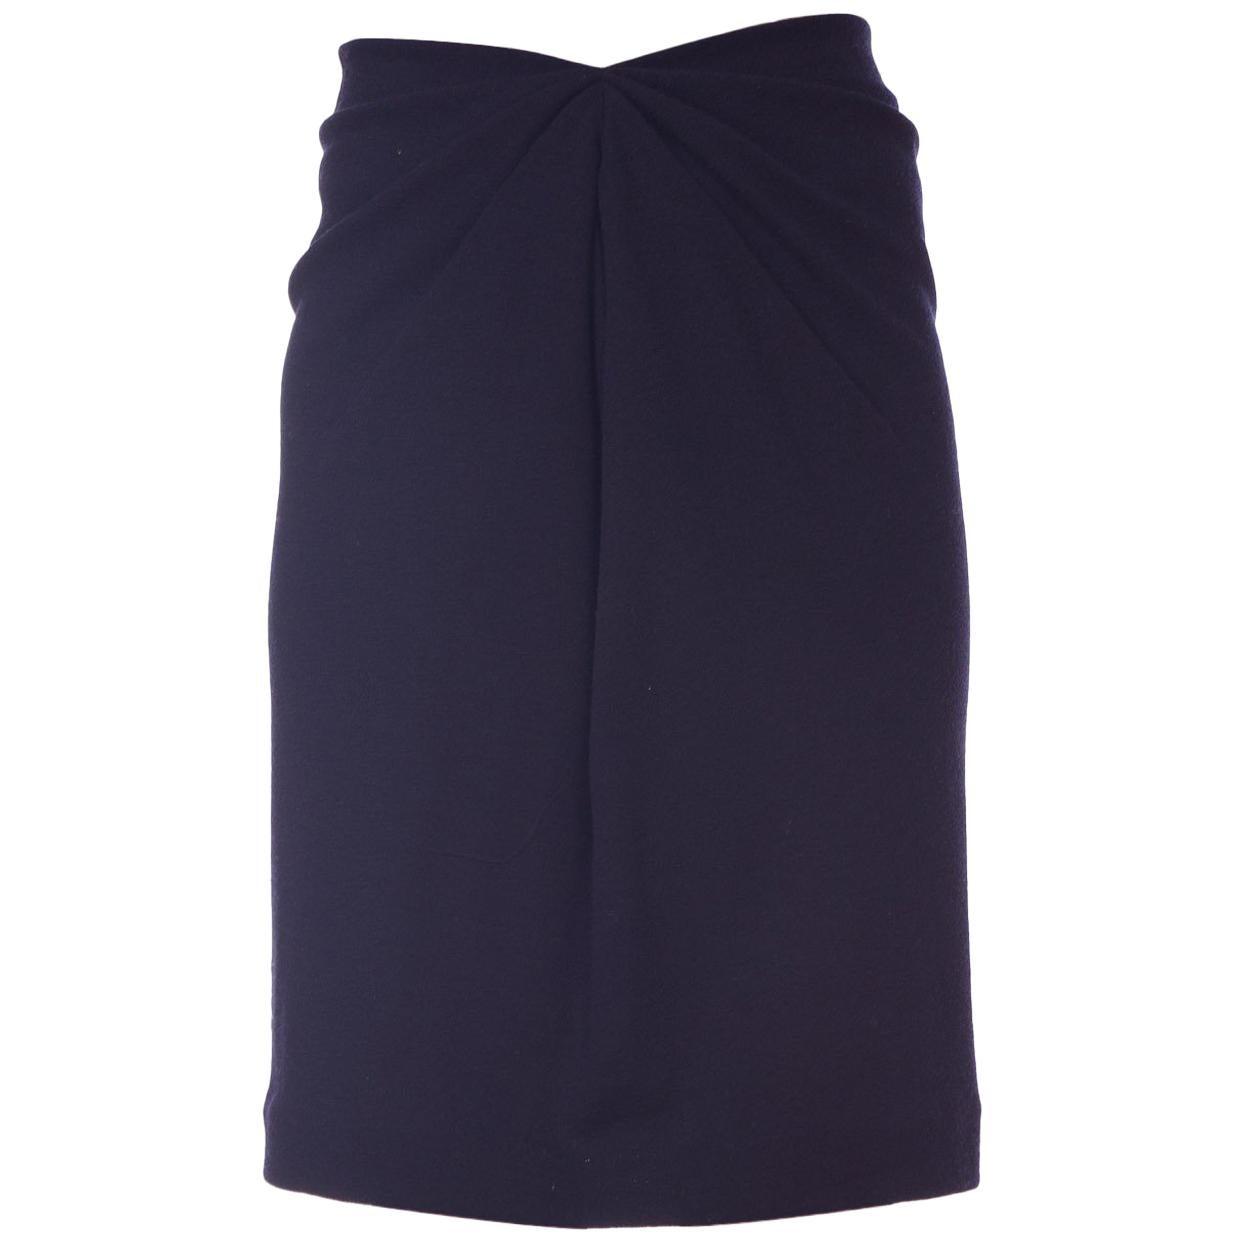 1980S DONNA KARAN Black Wool Jersey 40S Film Noir Style Skirt With Elastic Waist